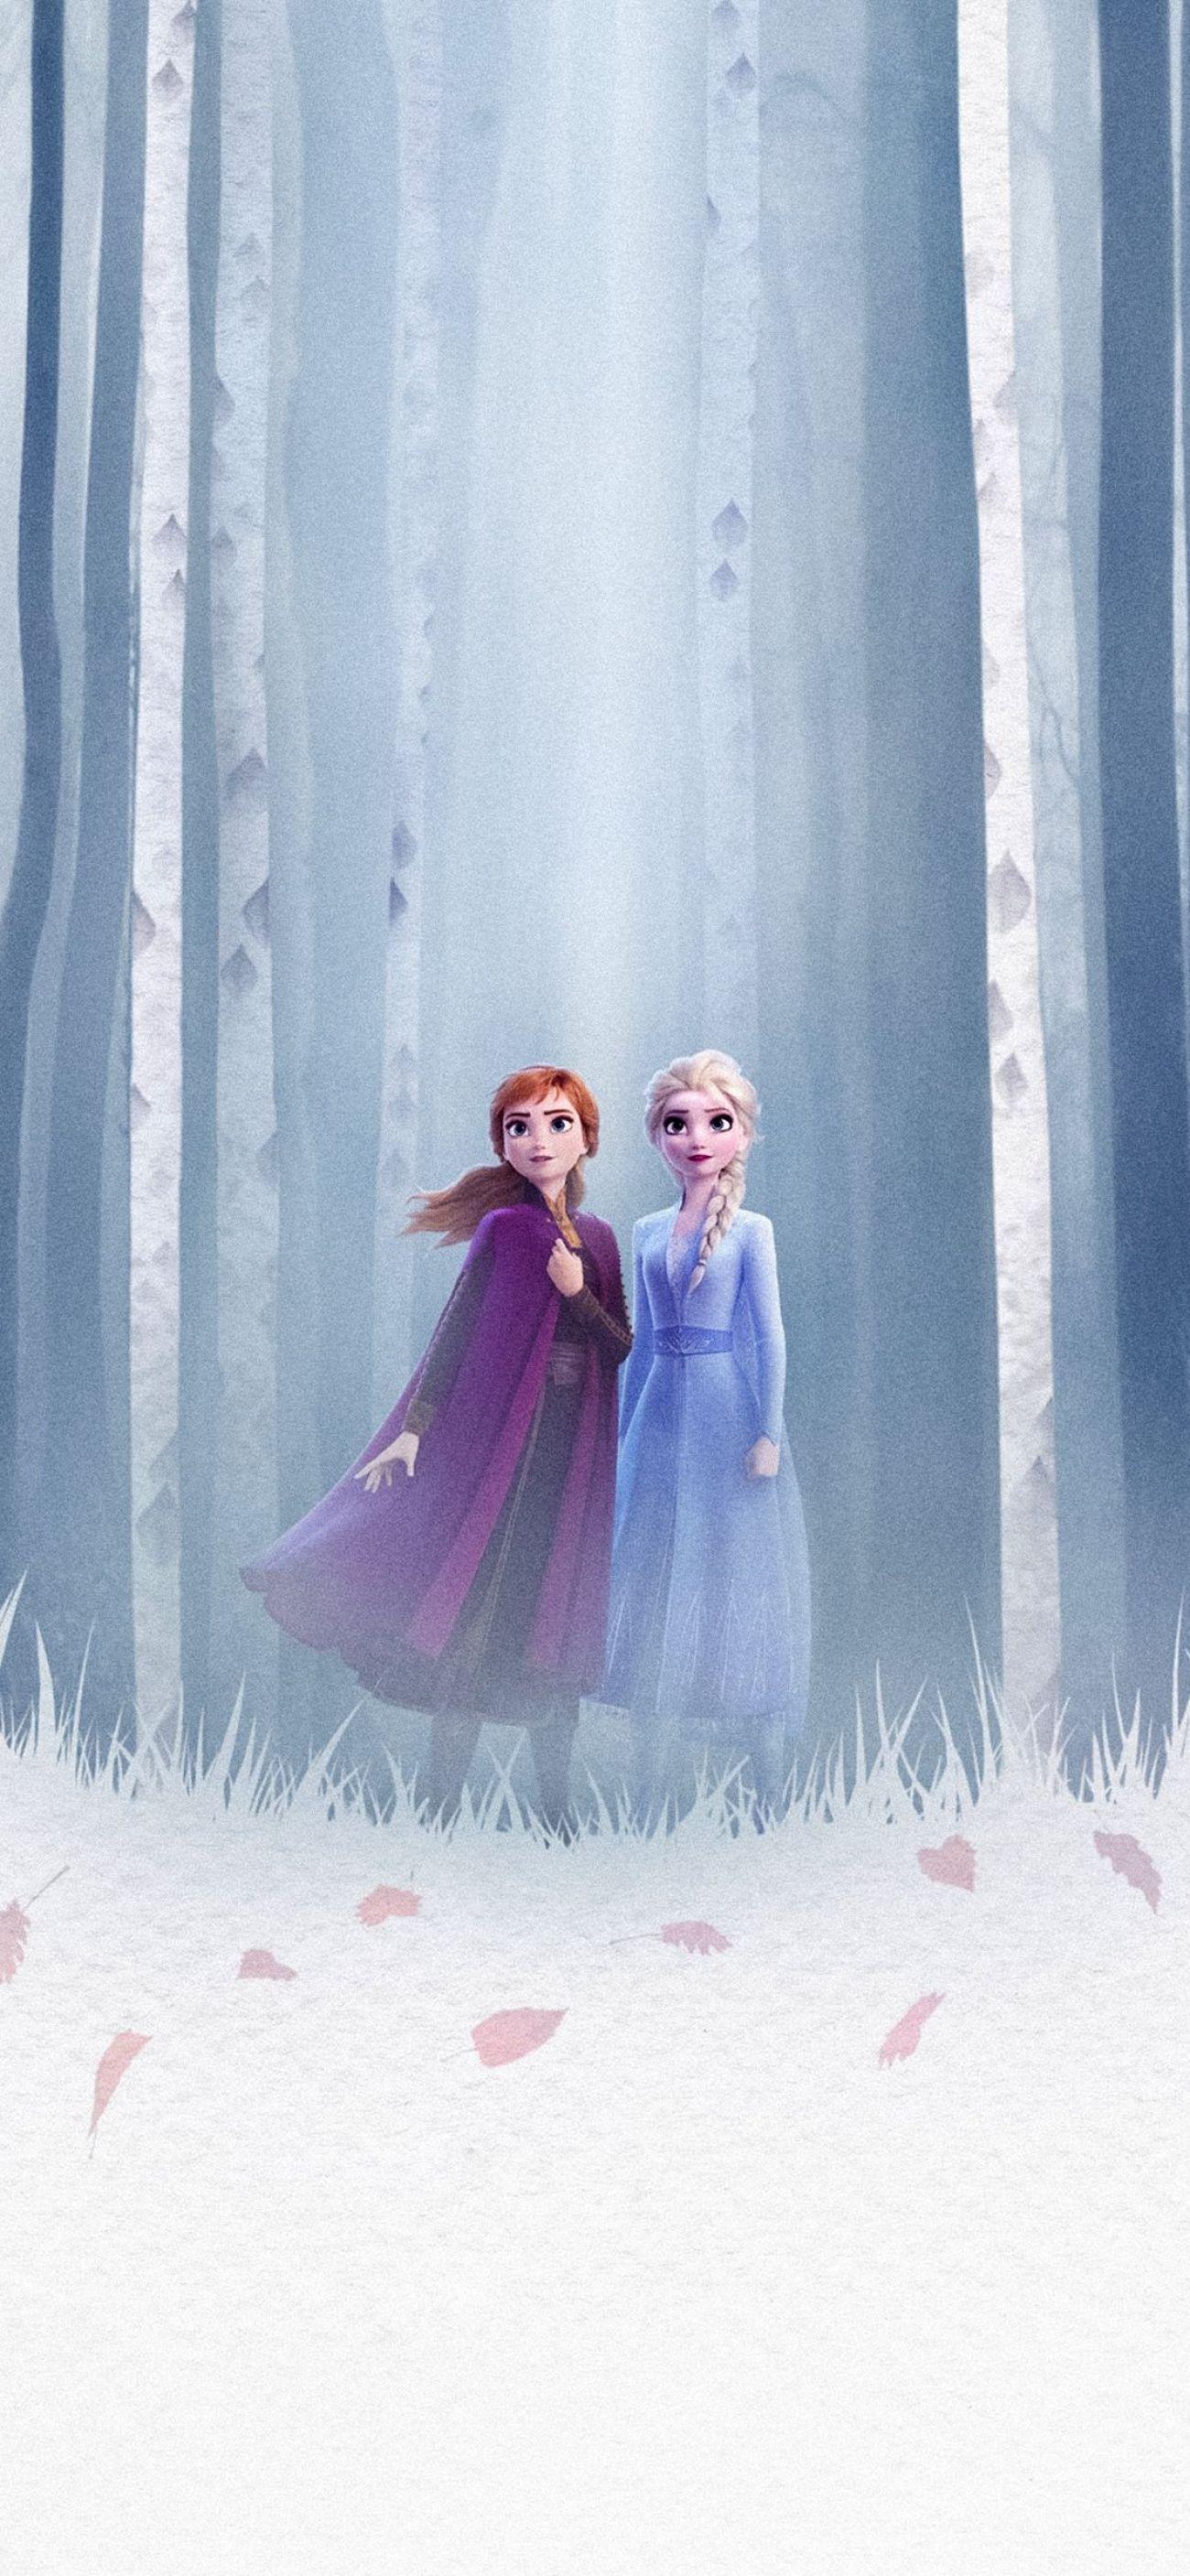 Elsa Frozen 2 Wallpapers Top Free Elsa Frozen 2 Backgrounds Wallpaperaccess